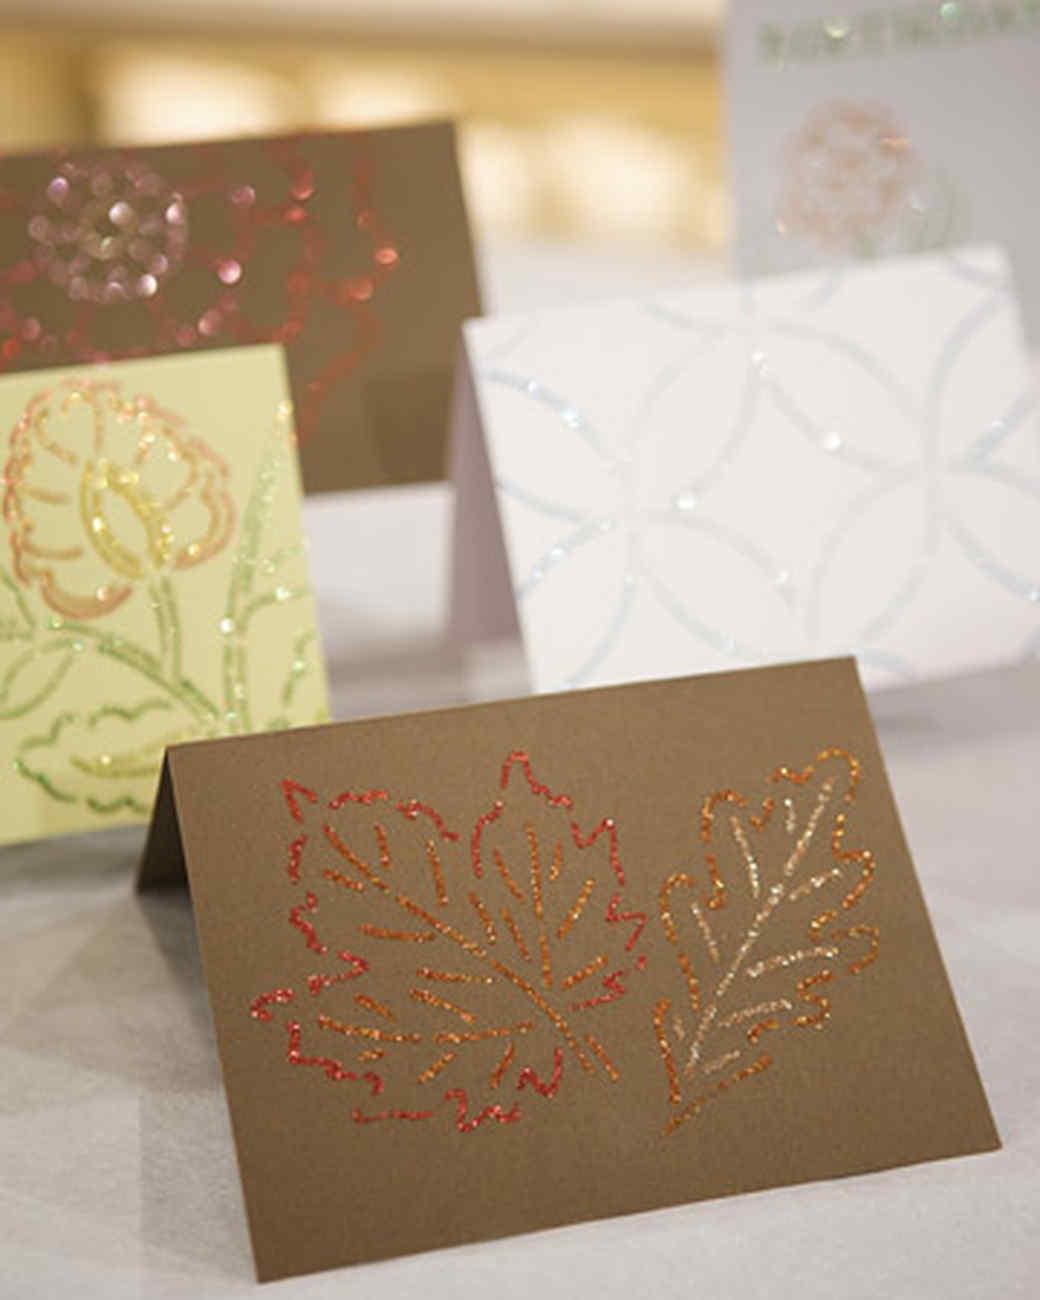 поделка открытка с блестками